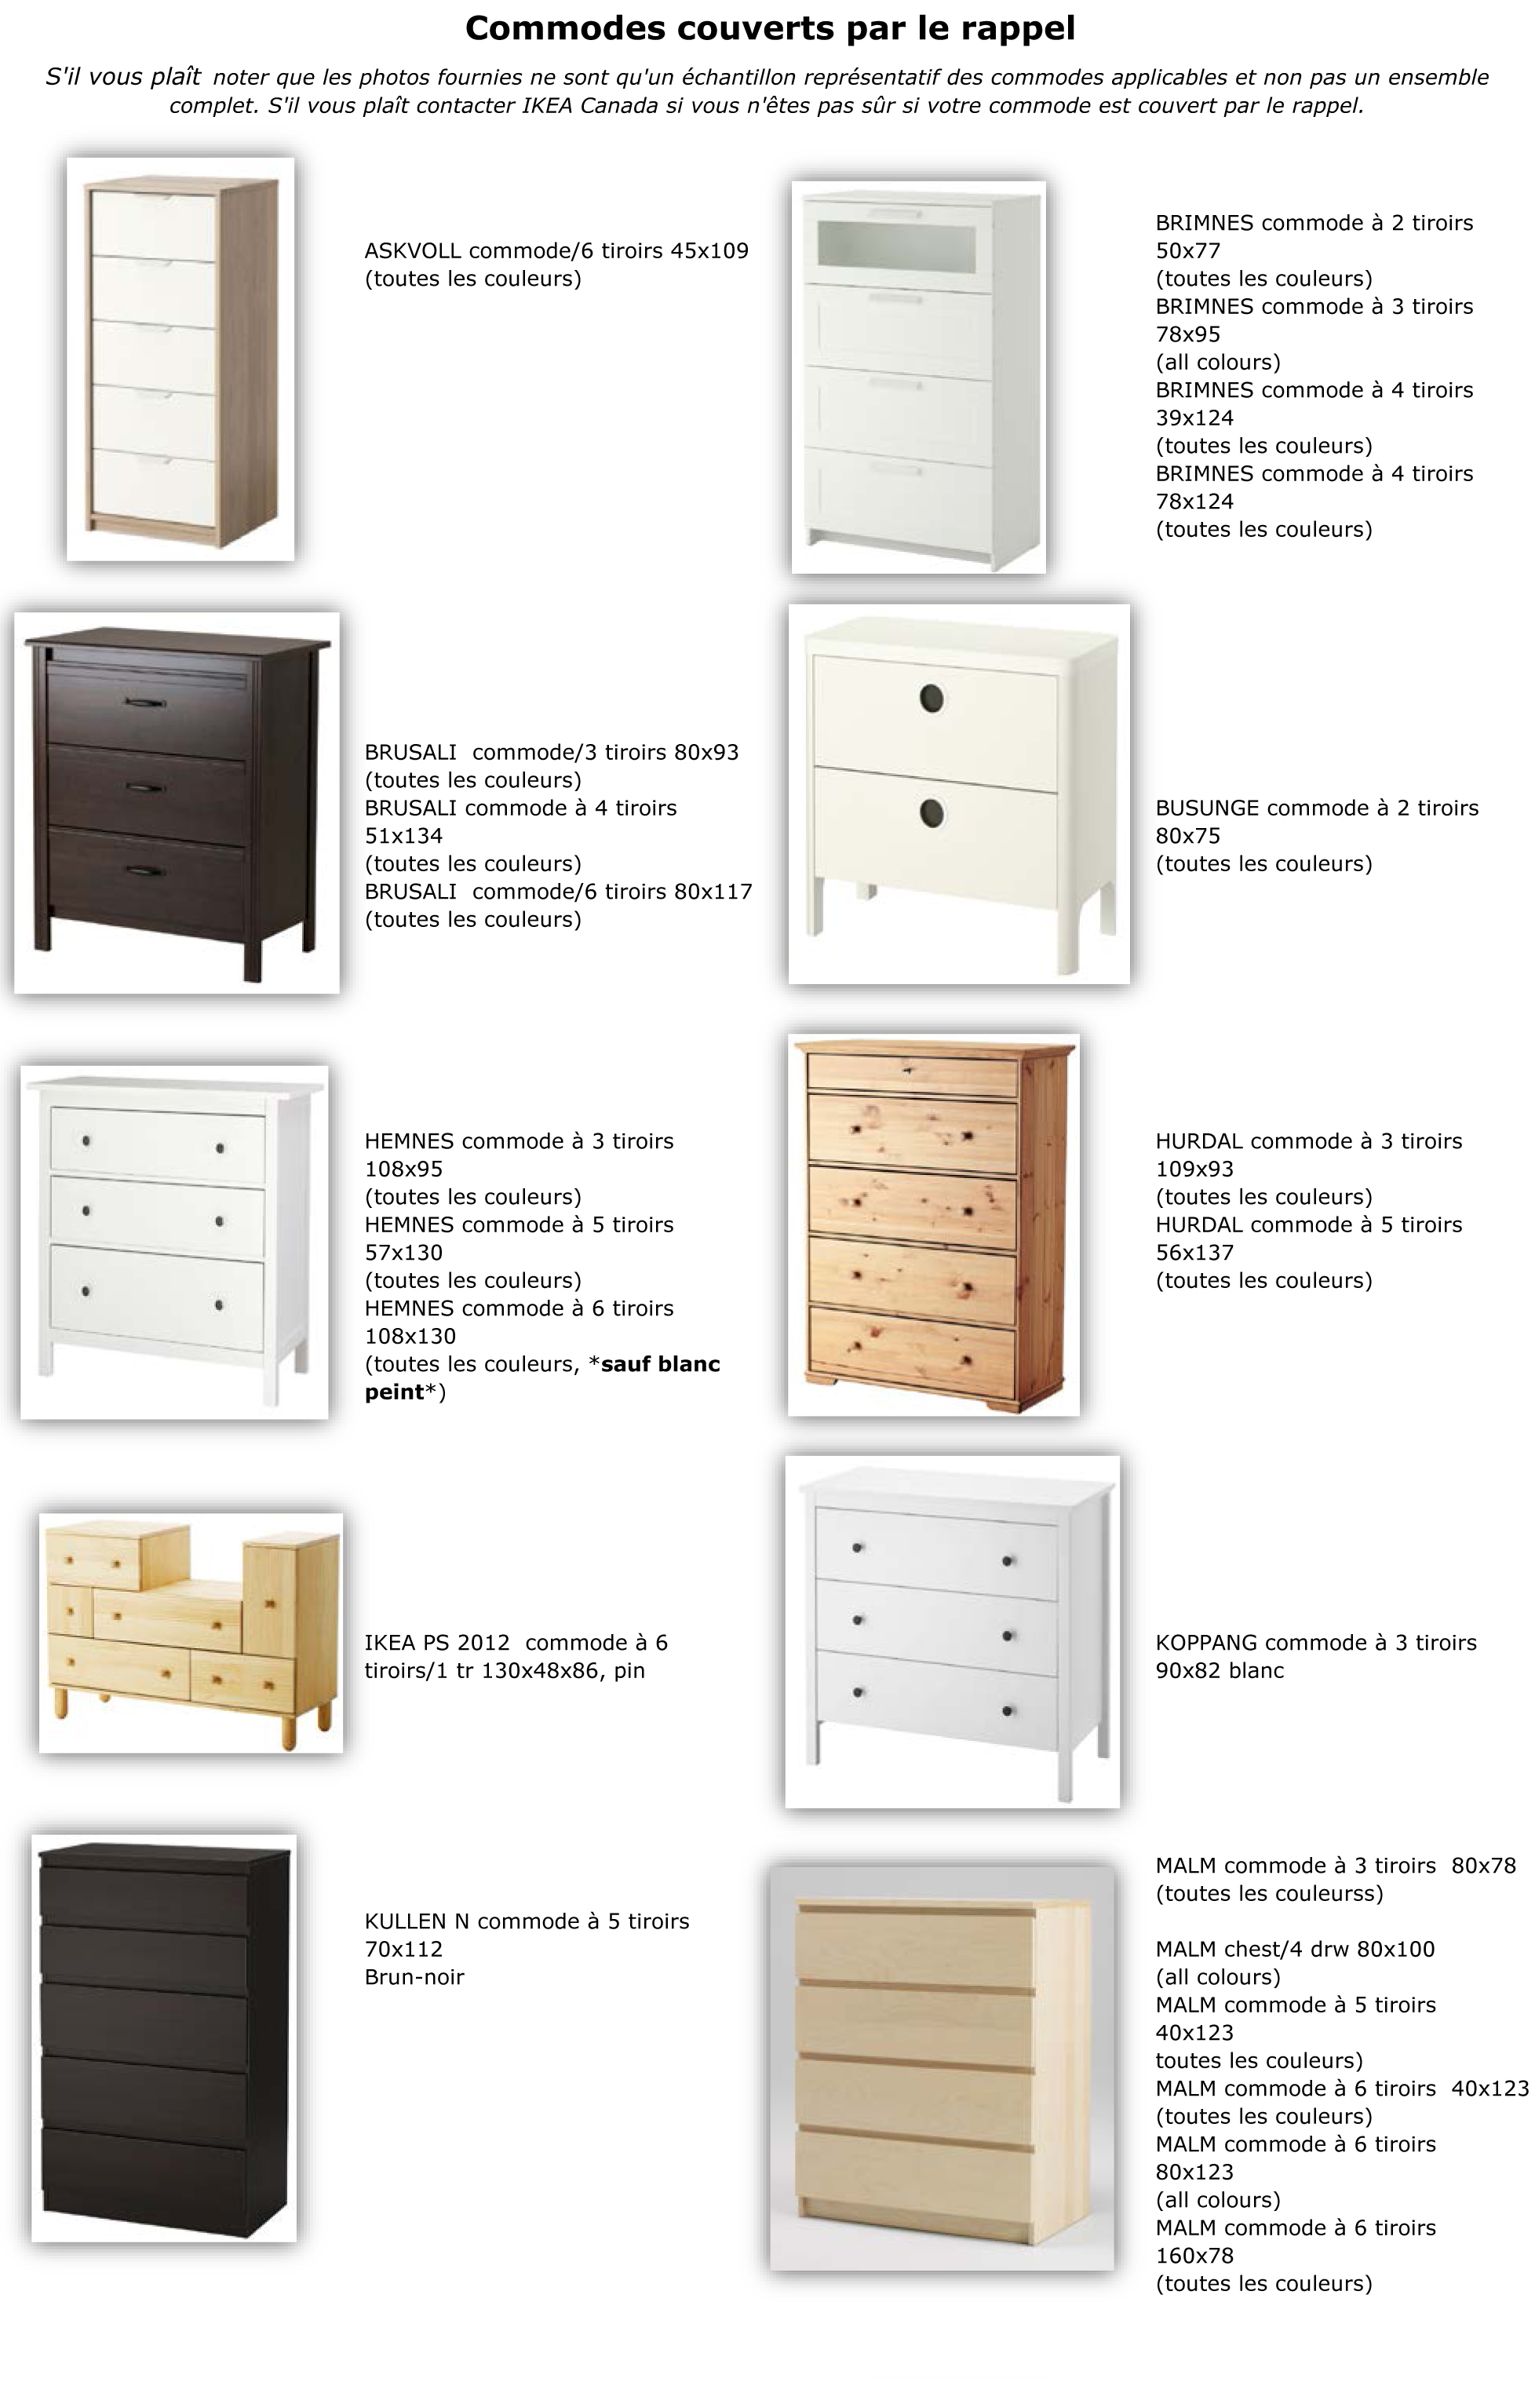 Rappel De Commodes De Marque Ikea Lexpress